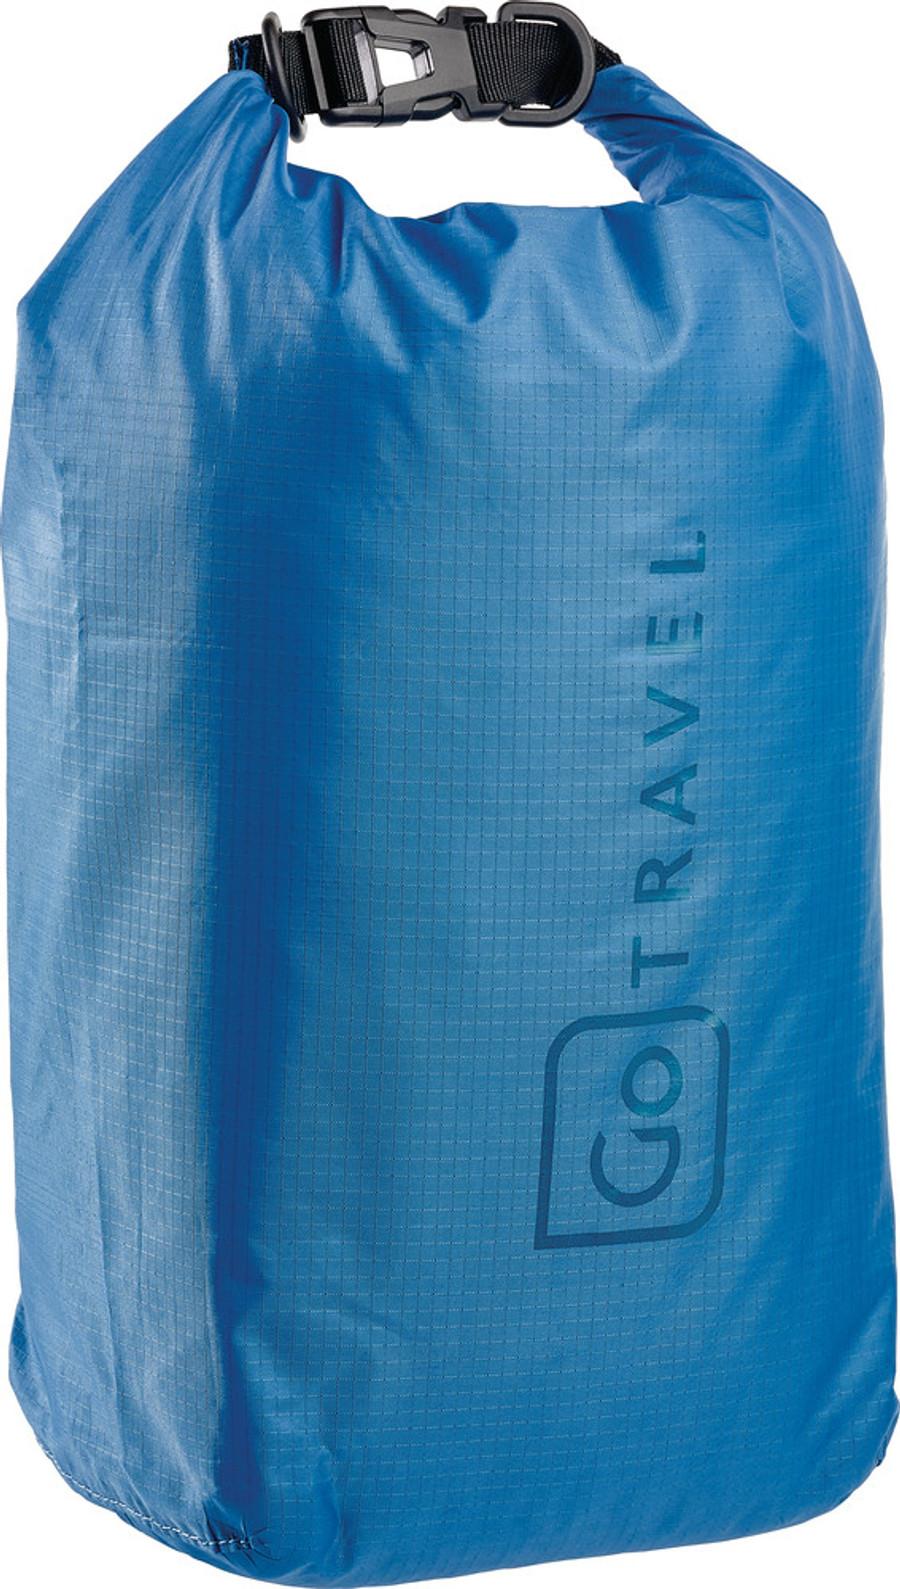 Wet or Dry Bag